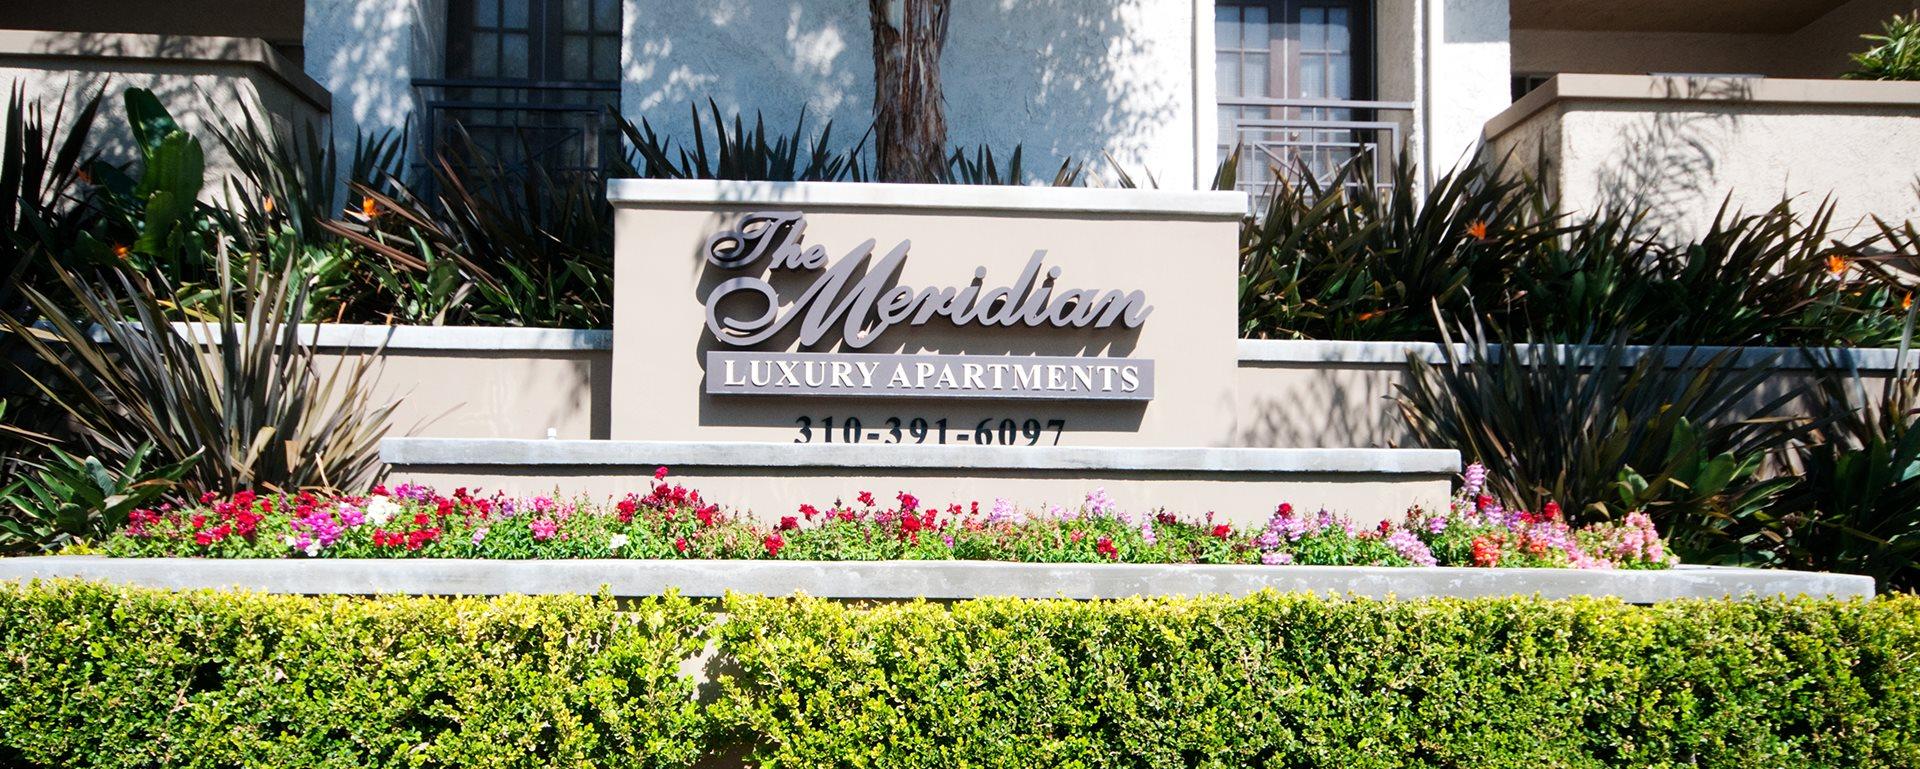 The Meridian Luxury Apartments Los Angeles